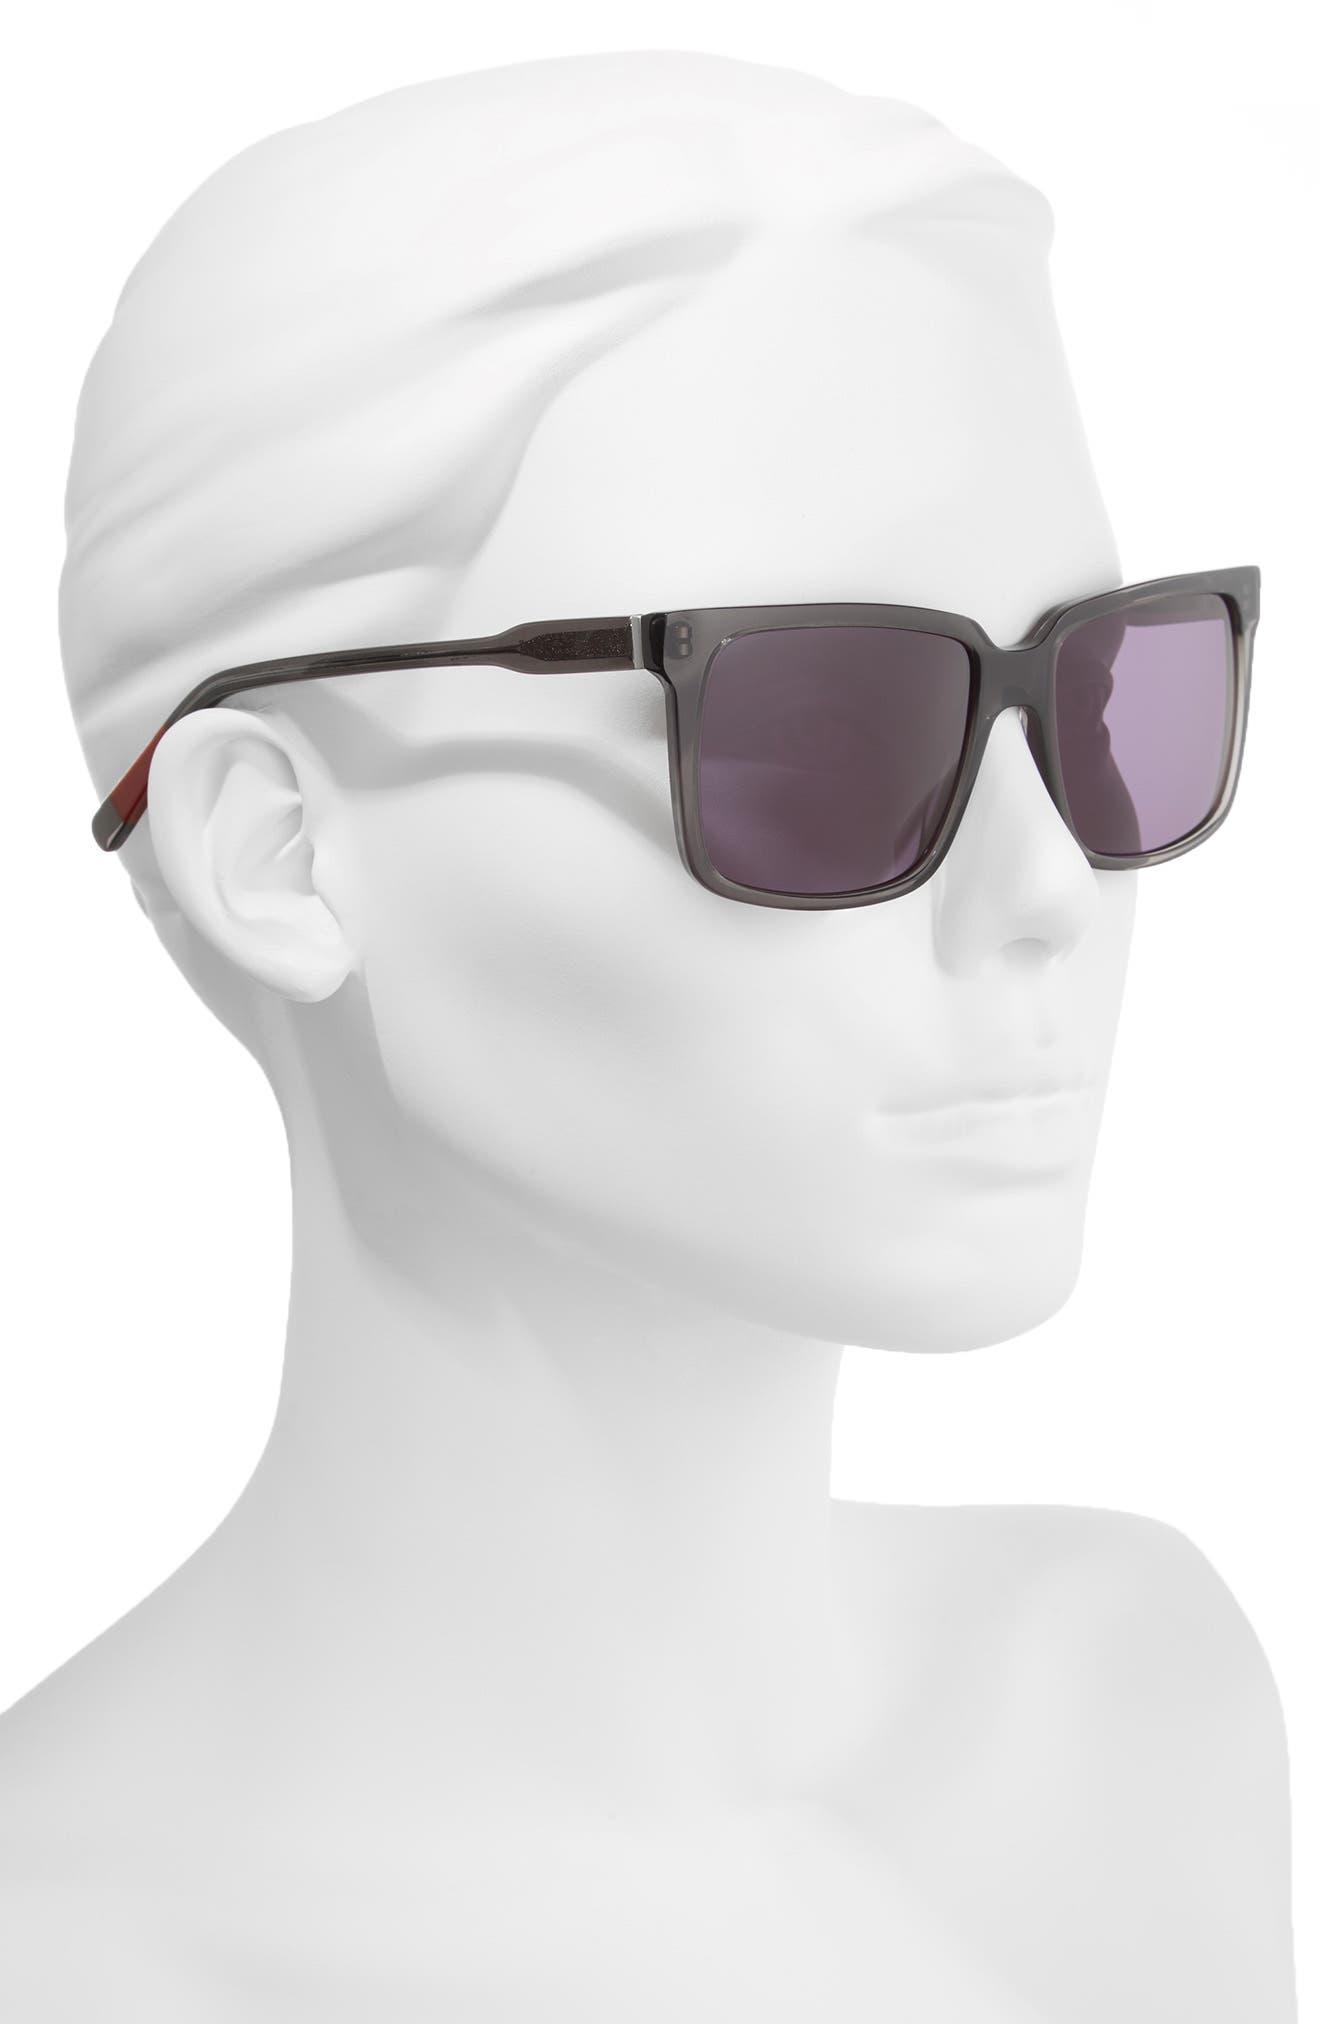 56mm Gradient Square Sunglasses,                             Alternate thumbnail 2, color,                             DARK GREY